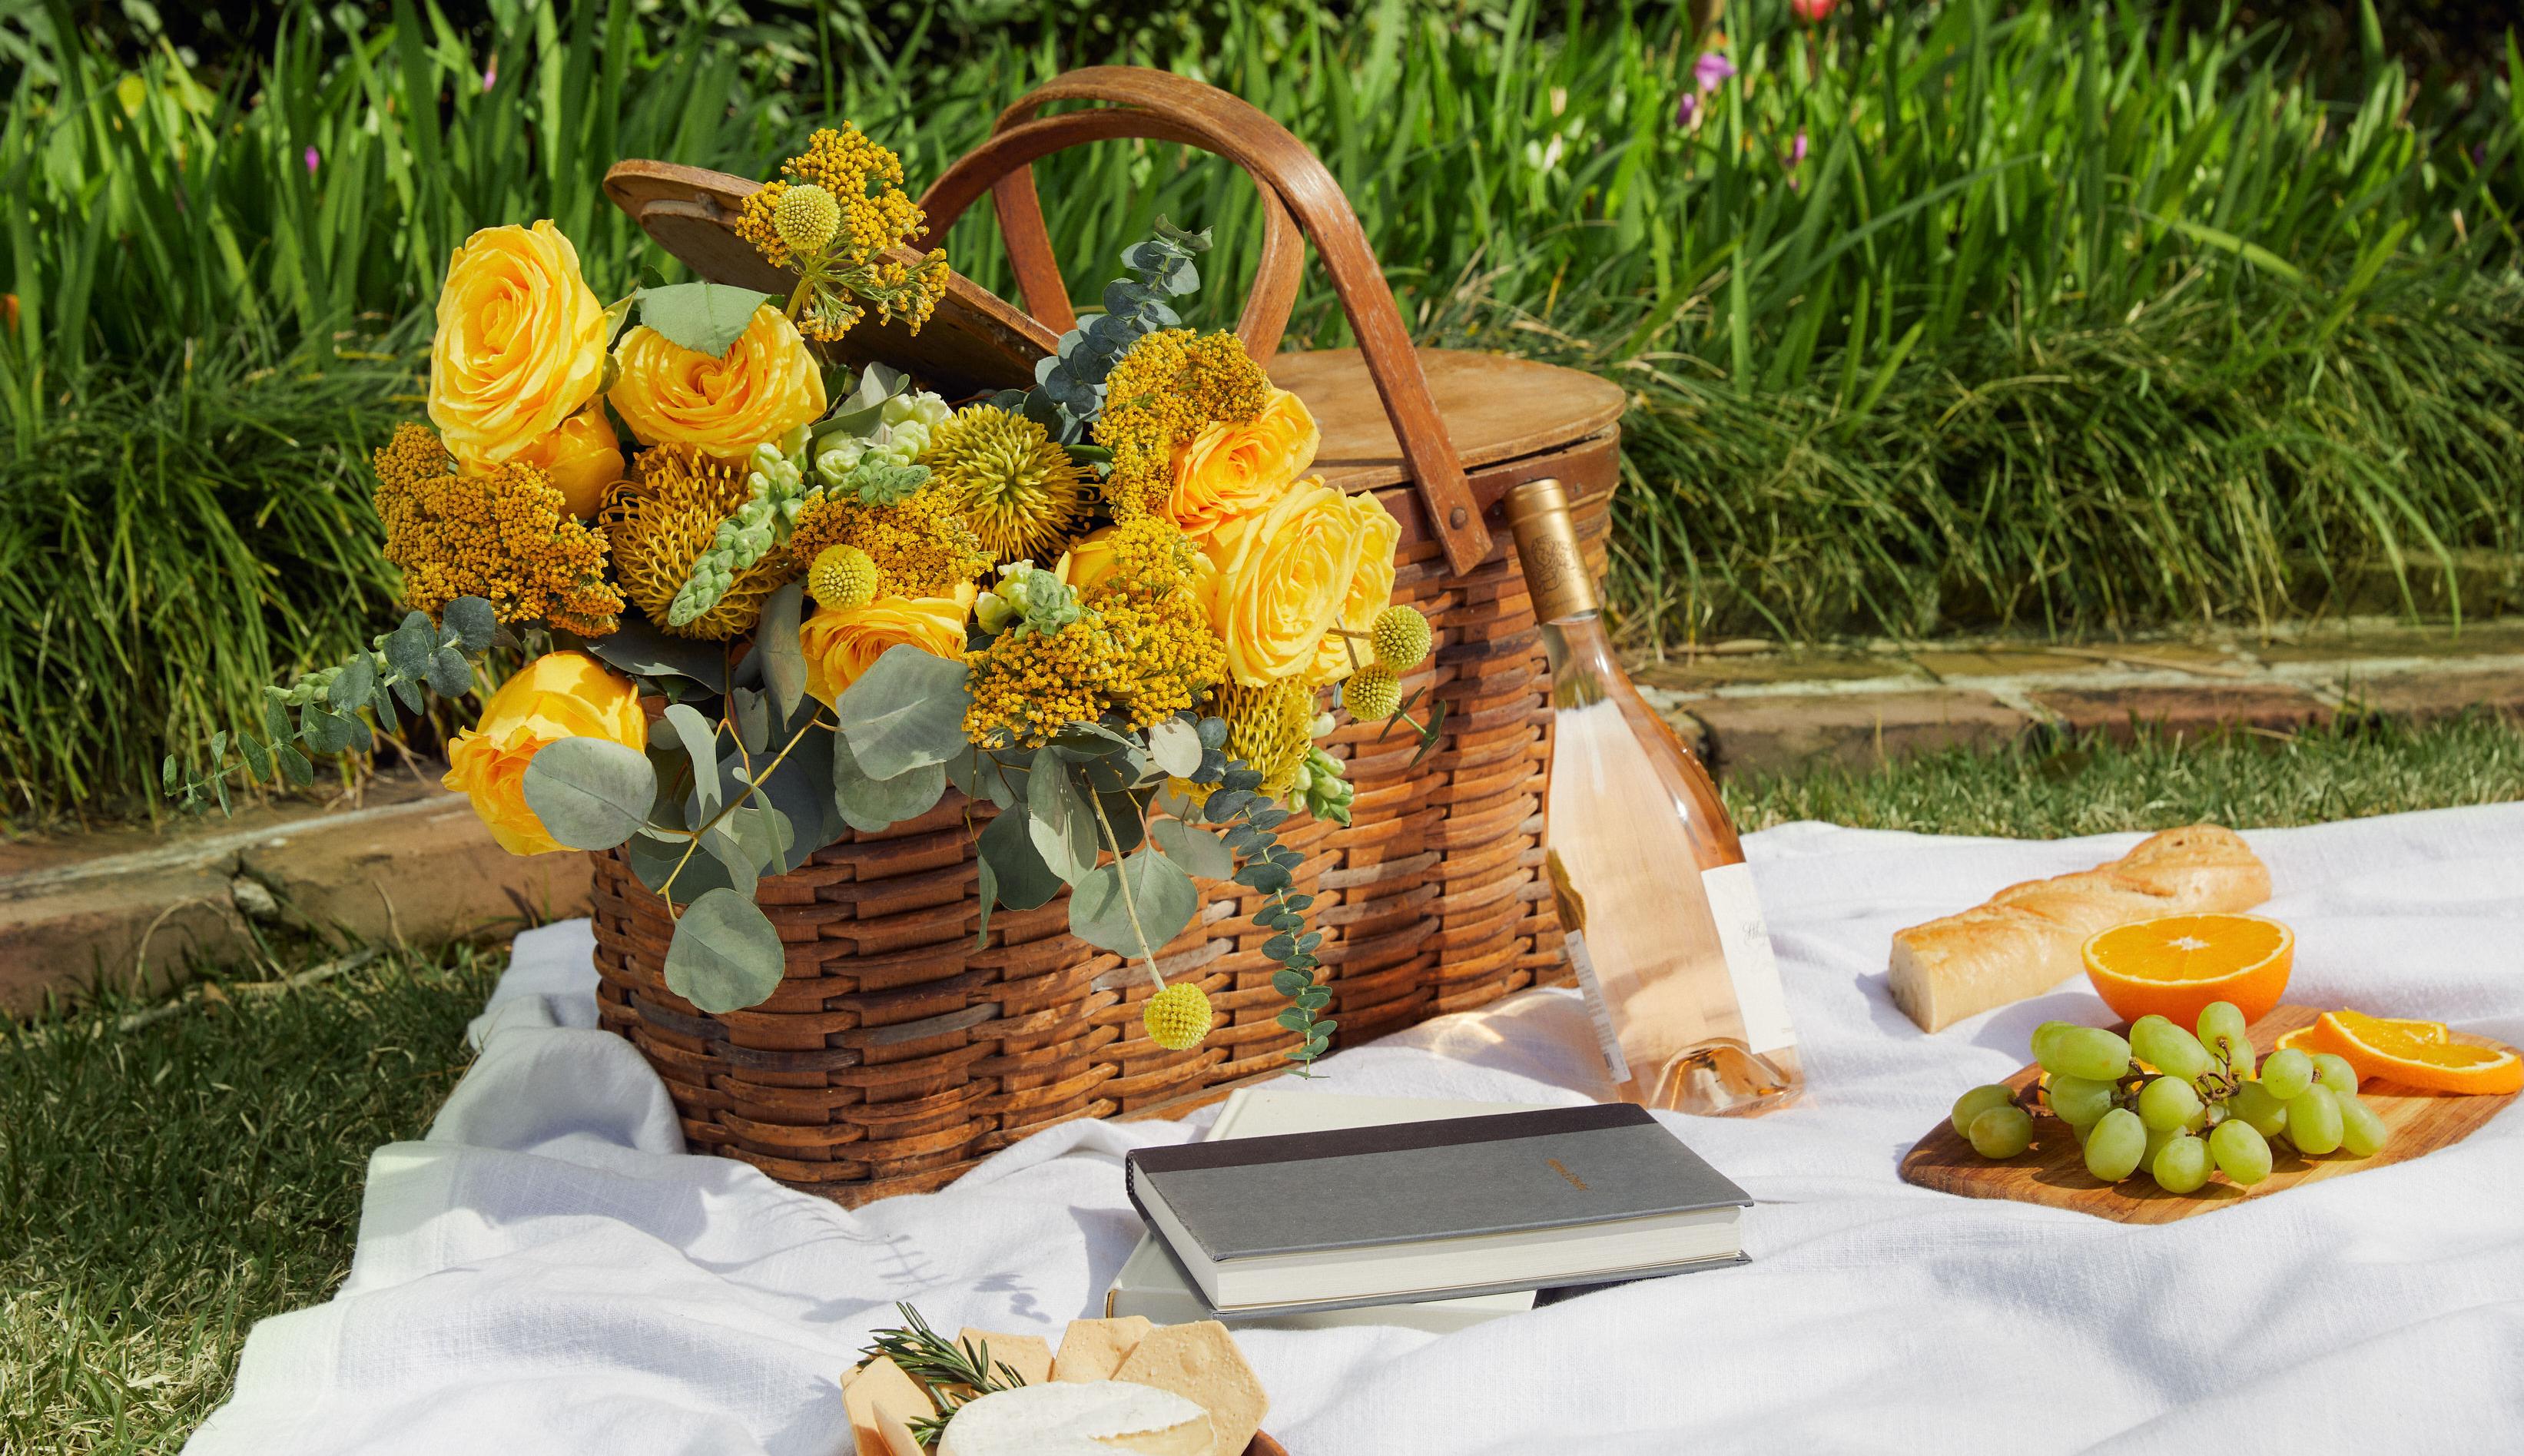 Picnic basket full of flowers outdoors